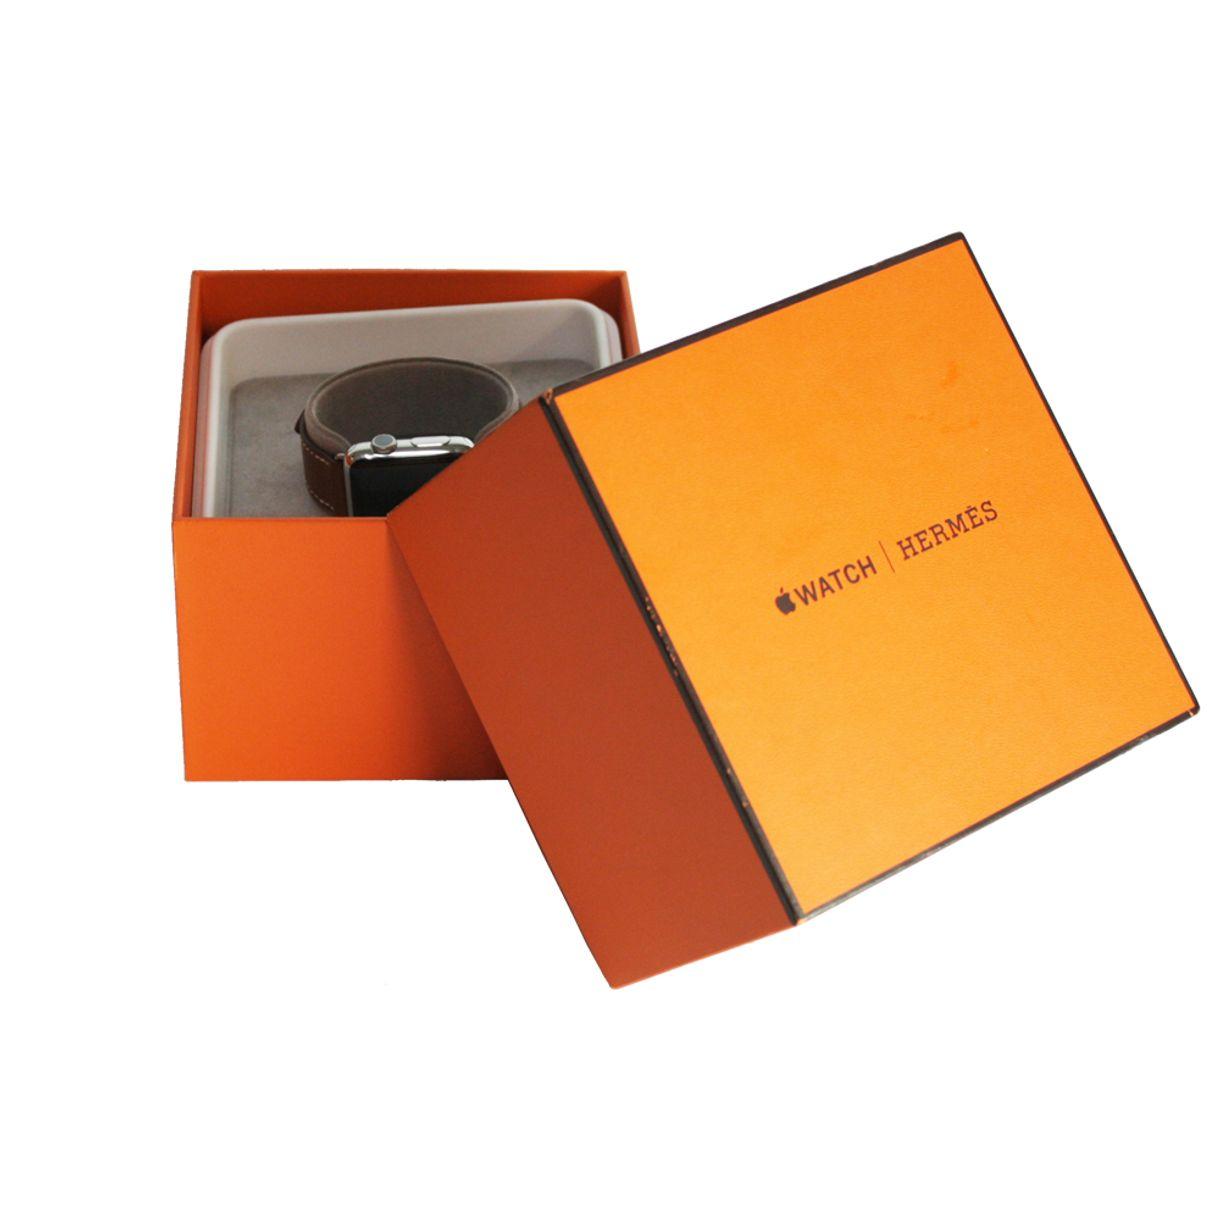 Apple-Watch-Hermes-Caramelo